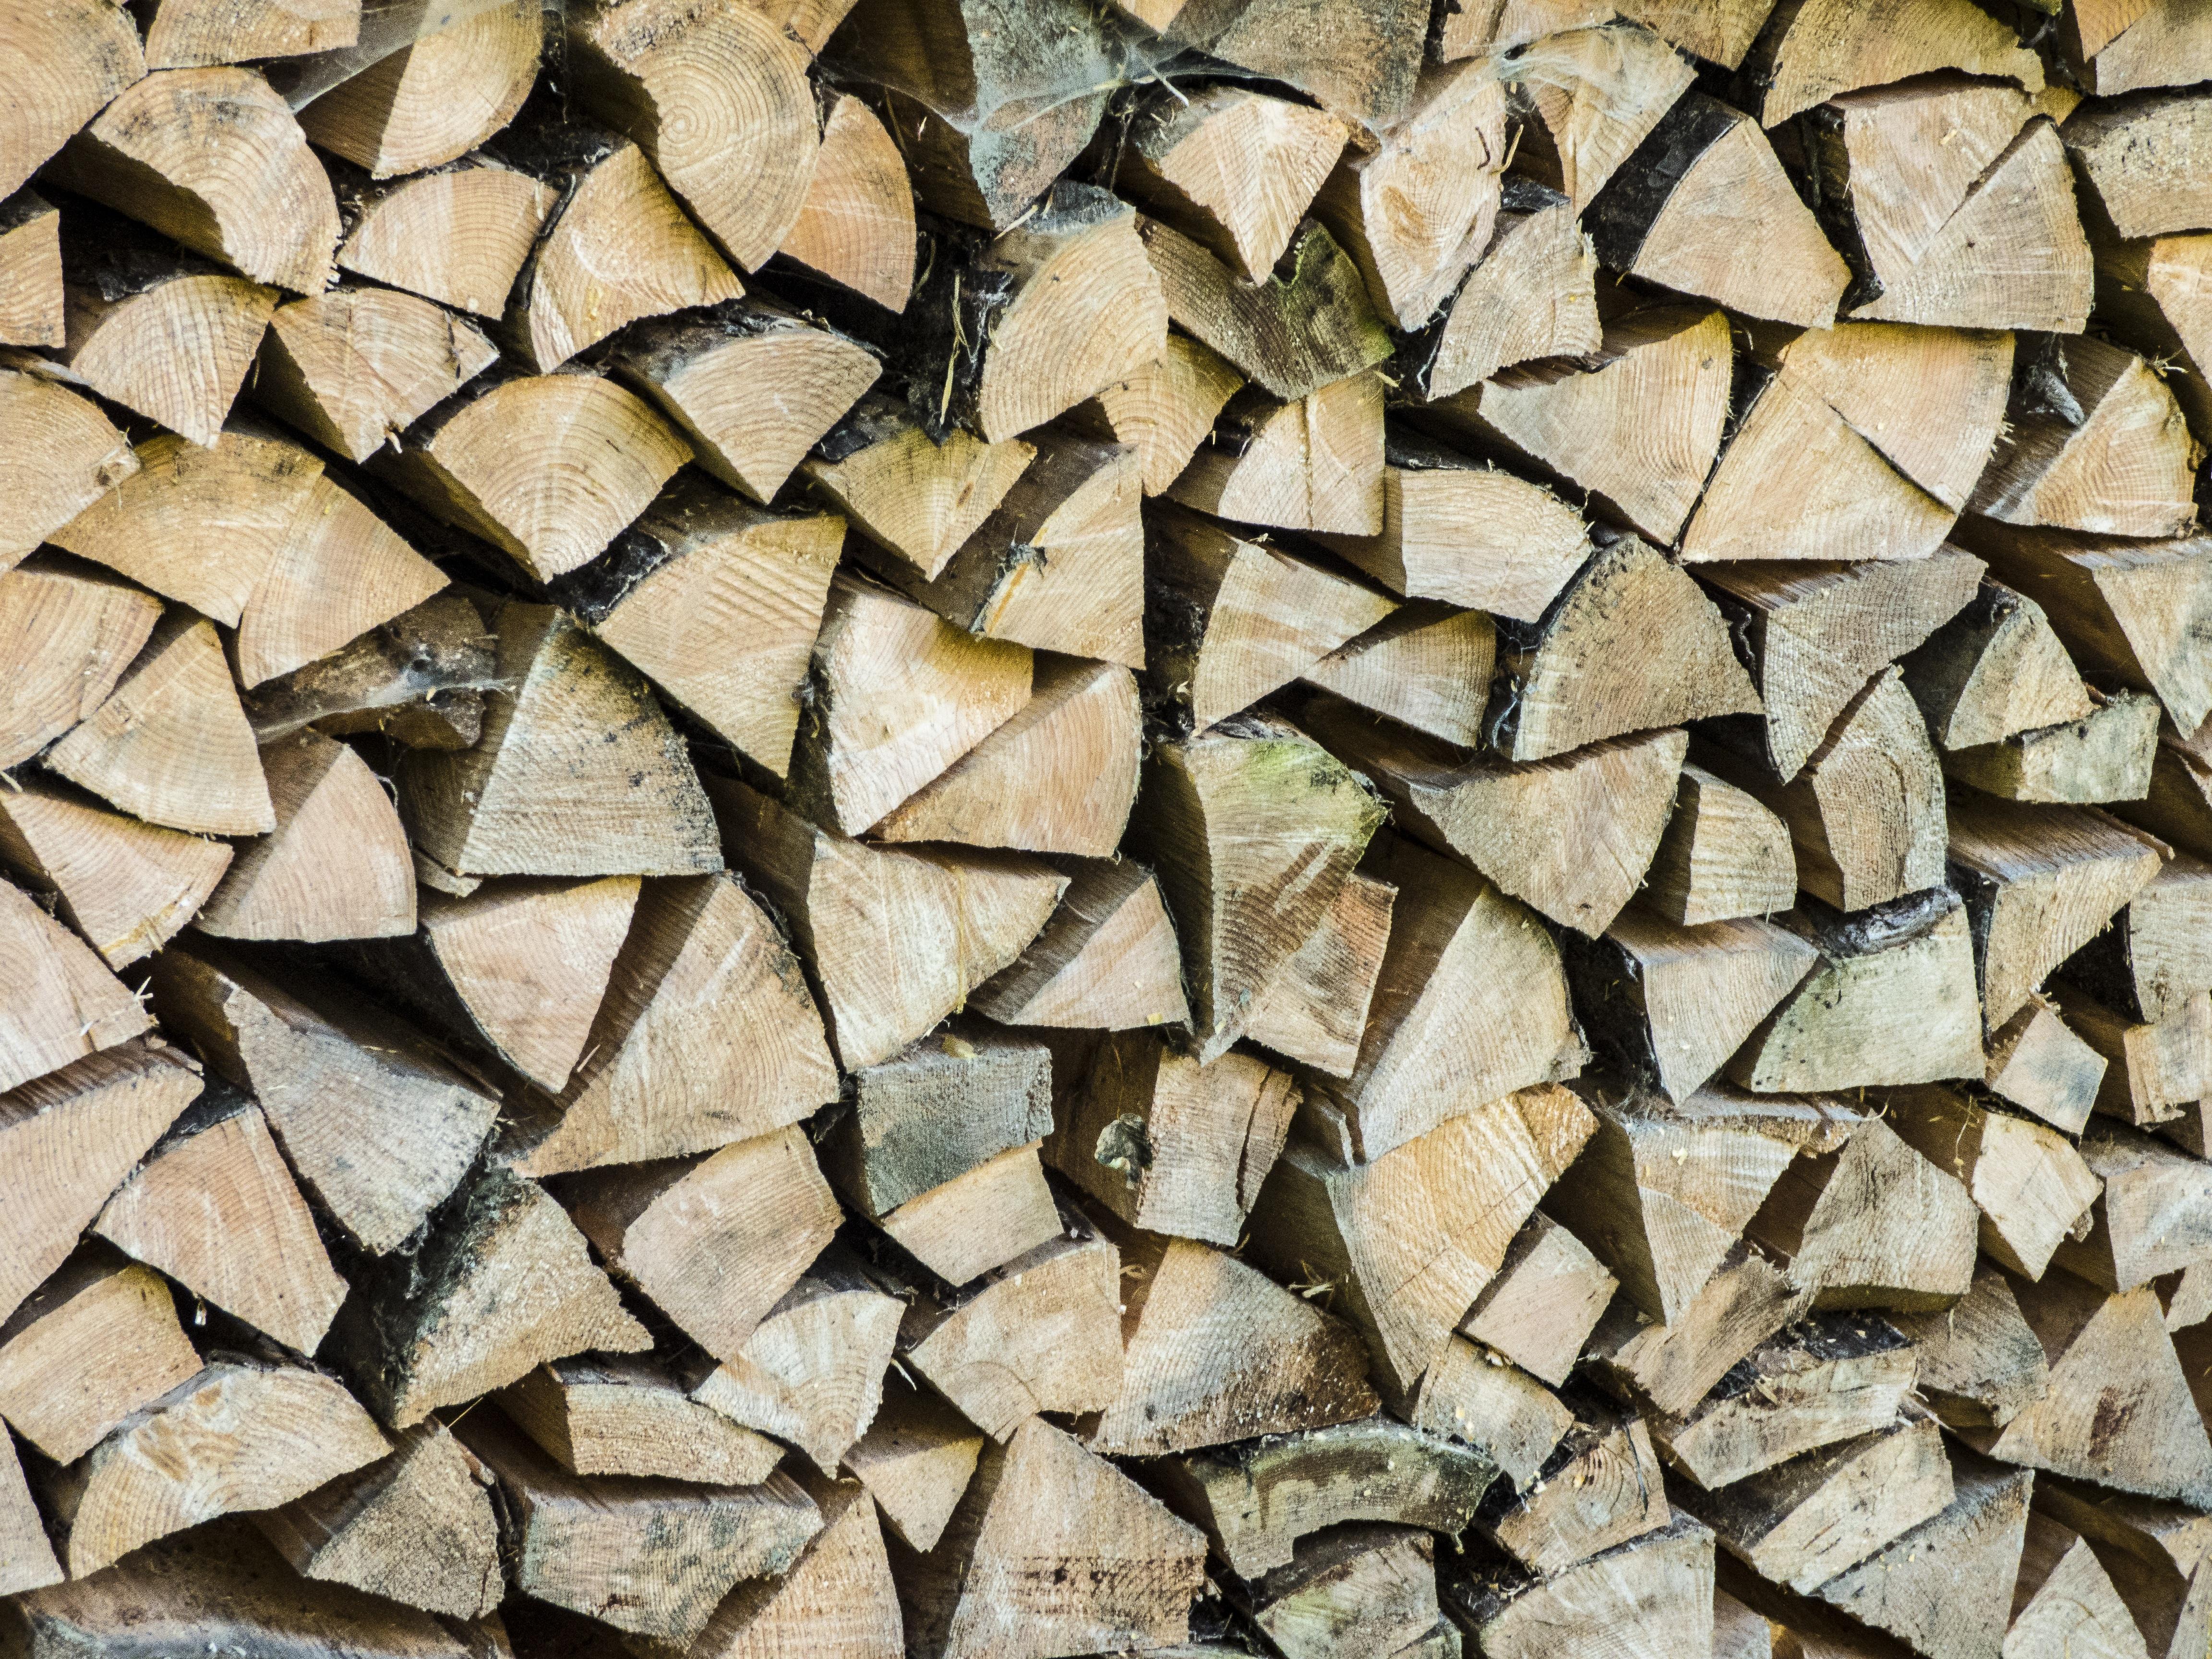 free images nature forest rock wood texture leaf floor